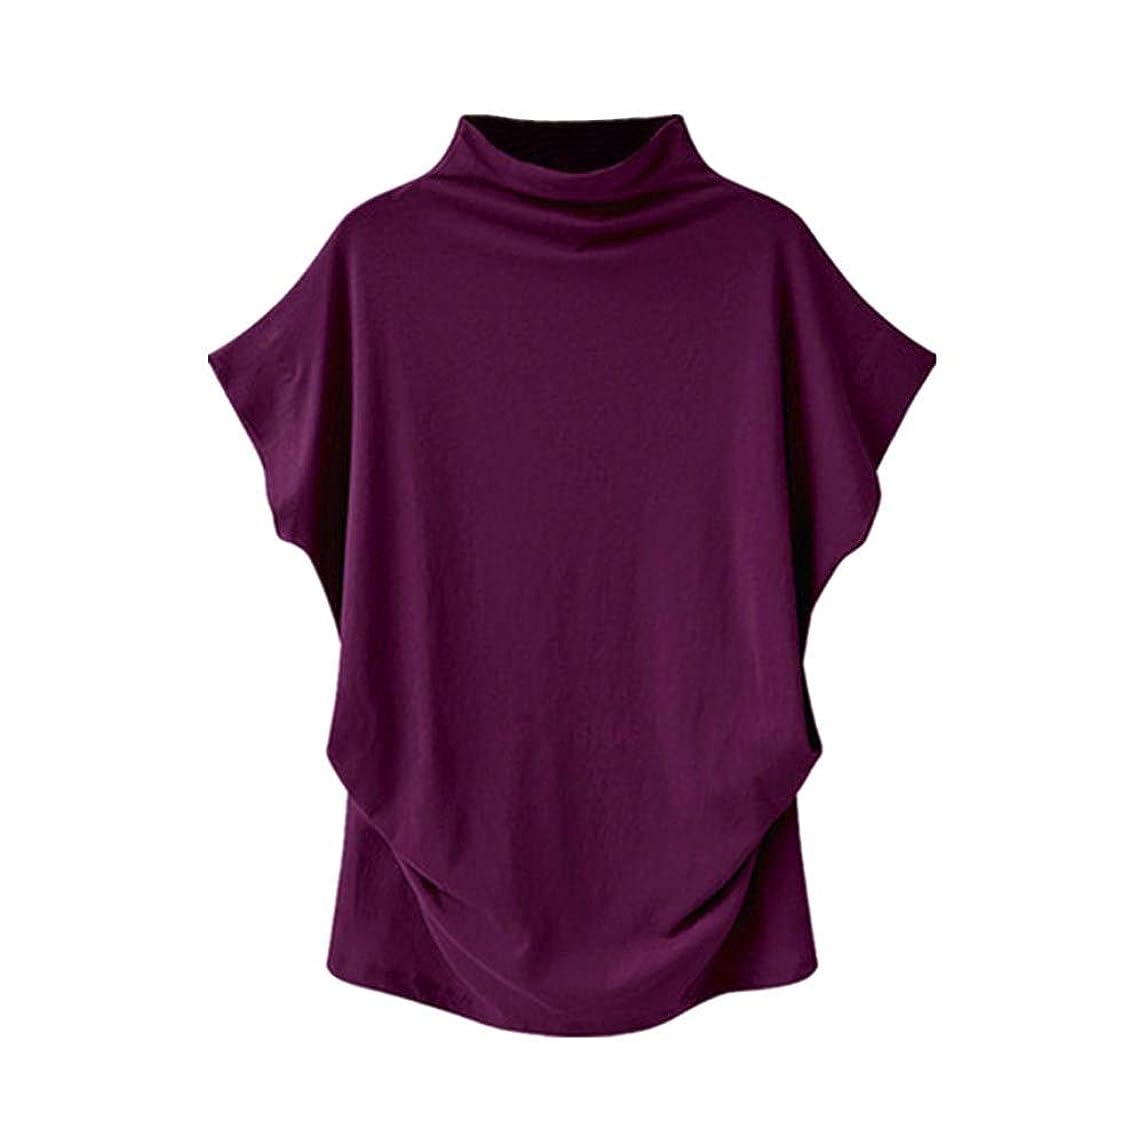 New in Summer Haalife??Women Turtleneck Short Sleeve Top Fashion Irregular Blouse T Shirt Casual Oversize Tunic Tops